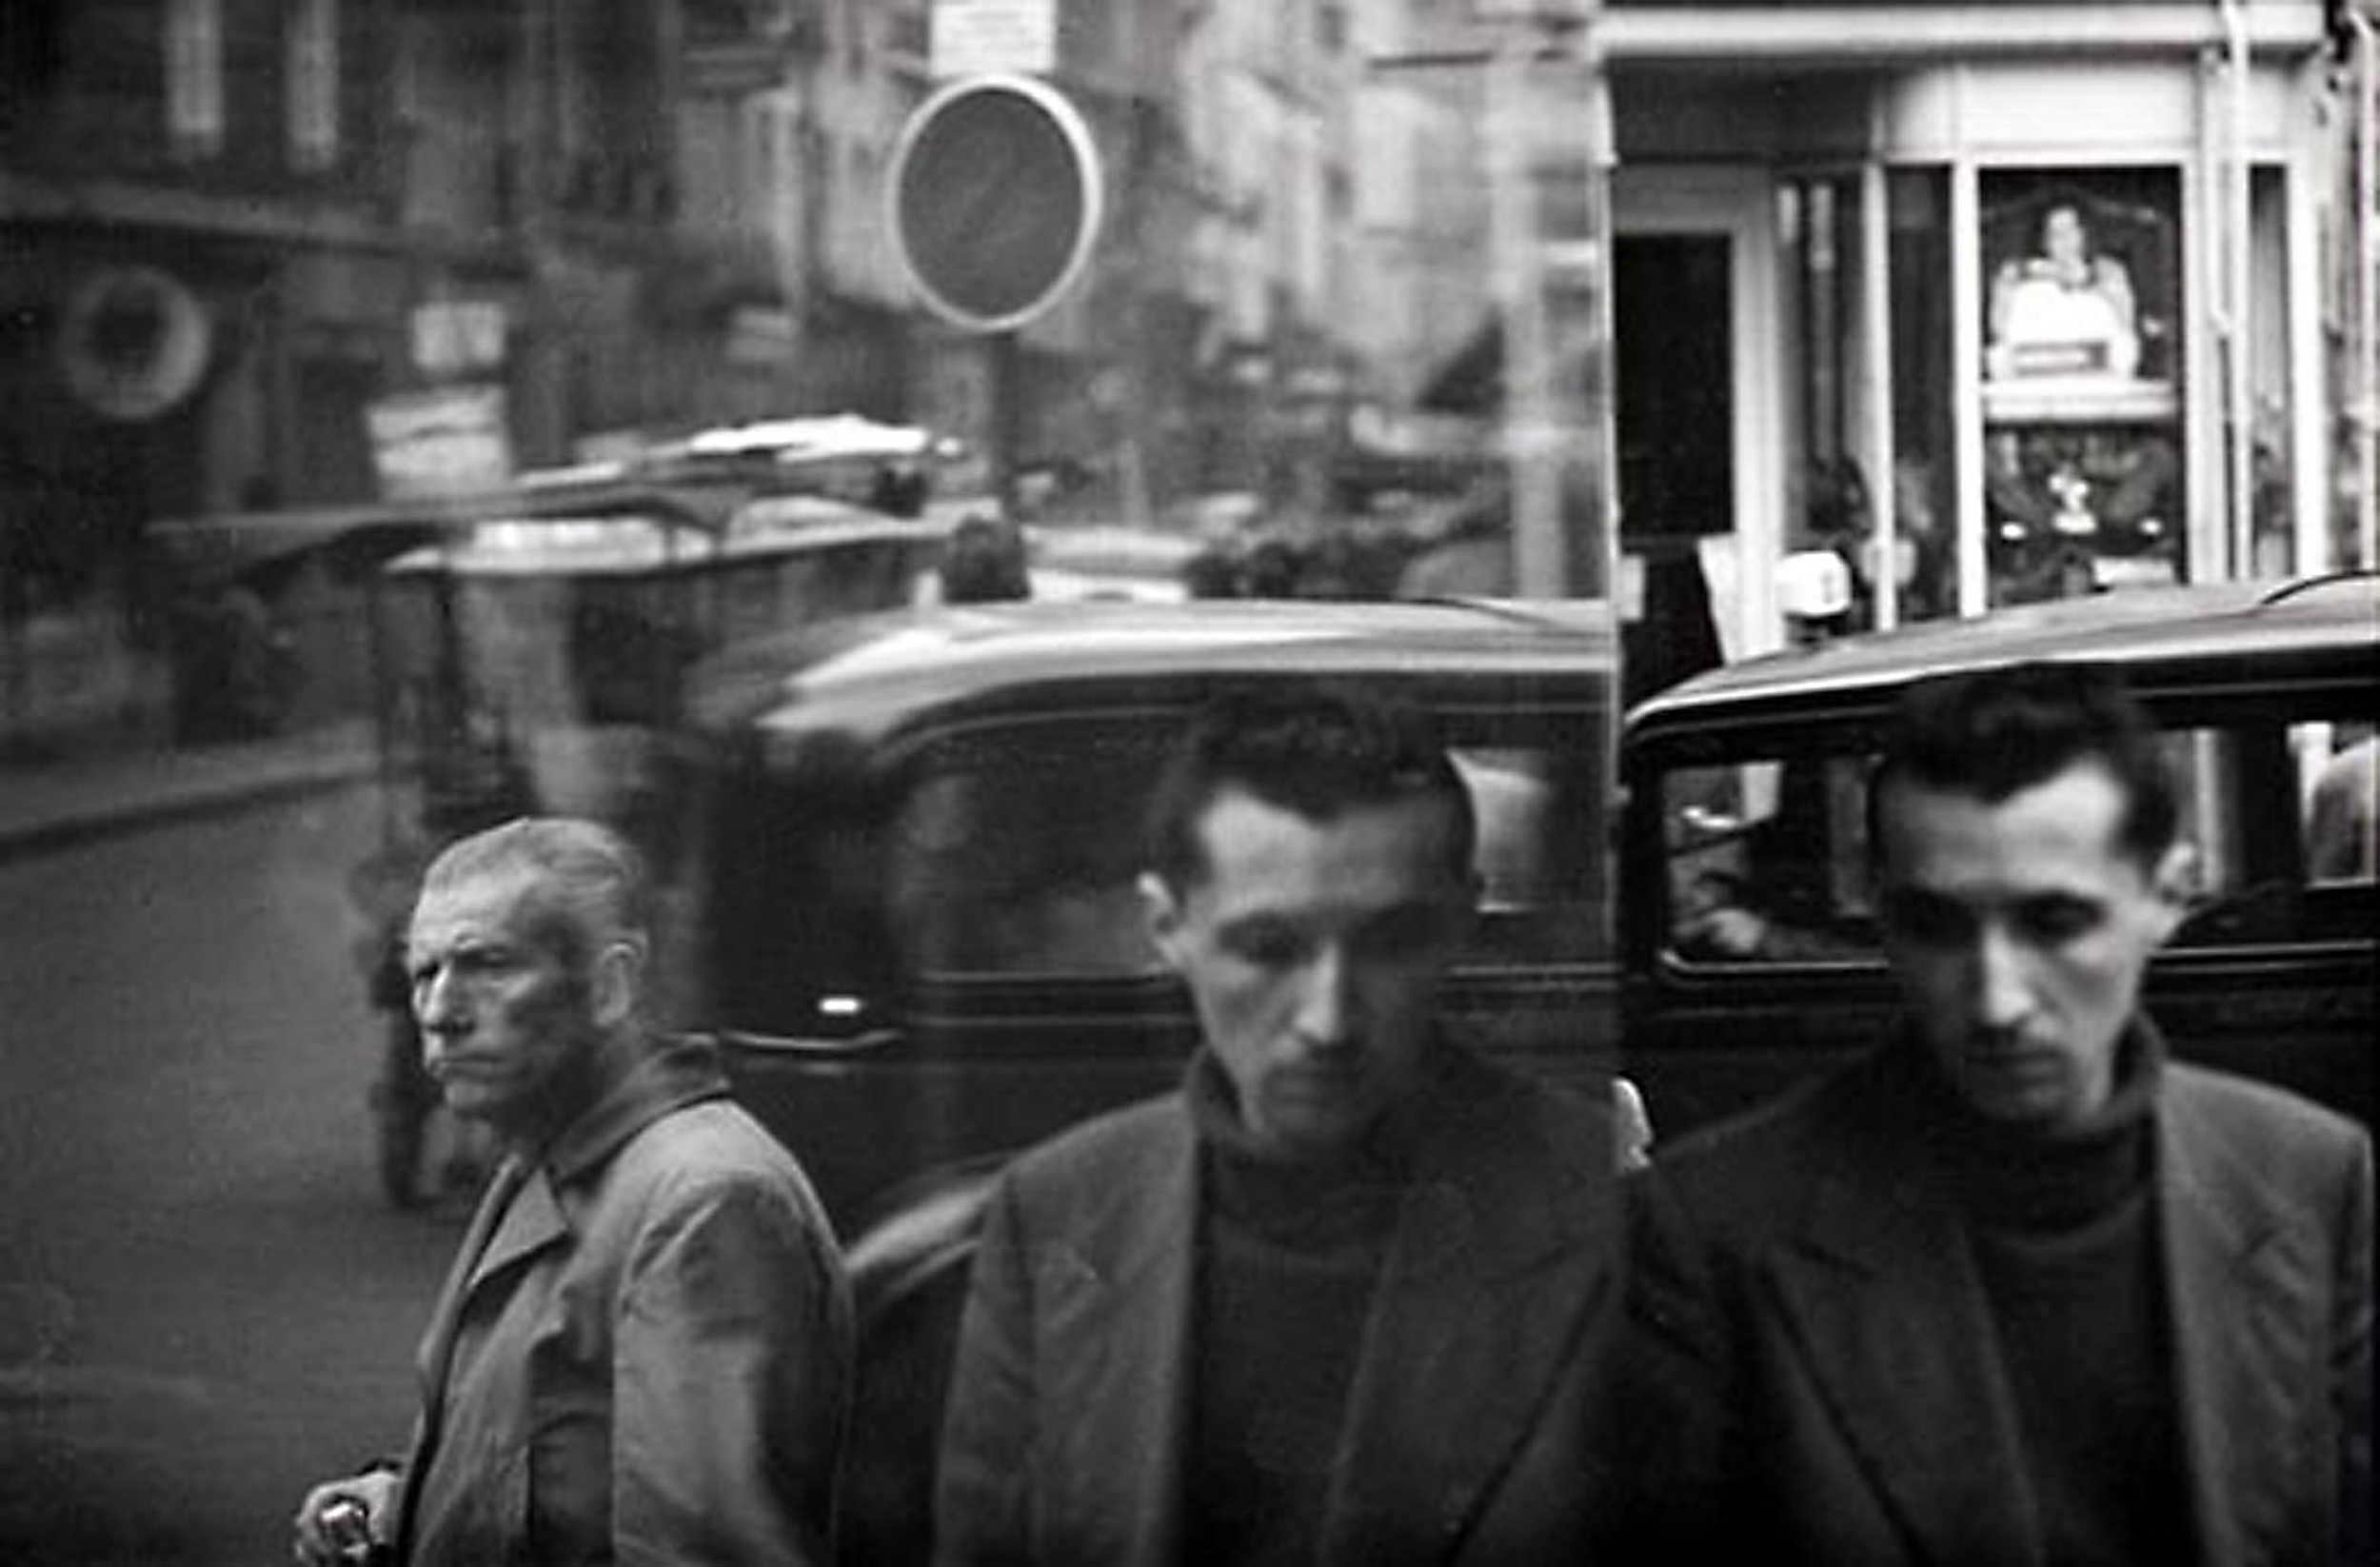 HANNON_reflection_(paris)_1955_11x14_high.jpg